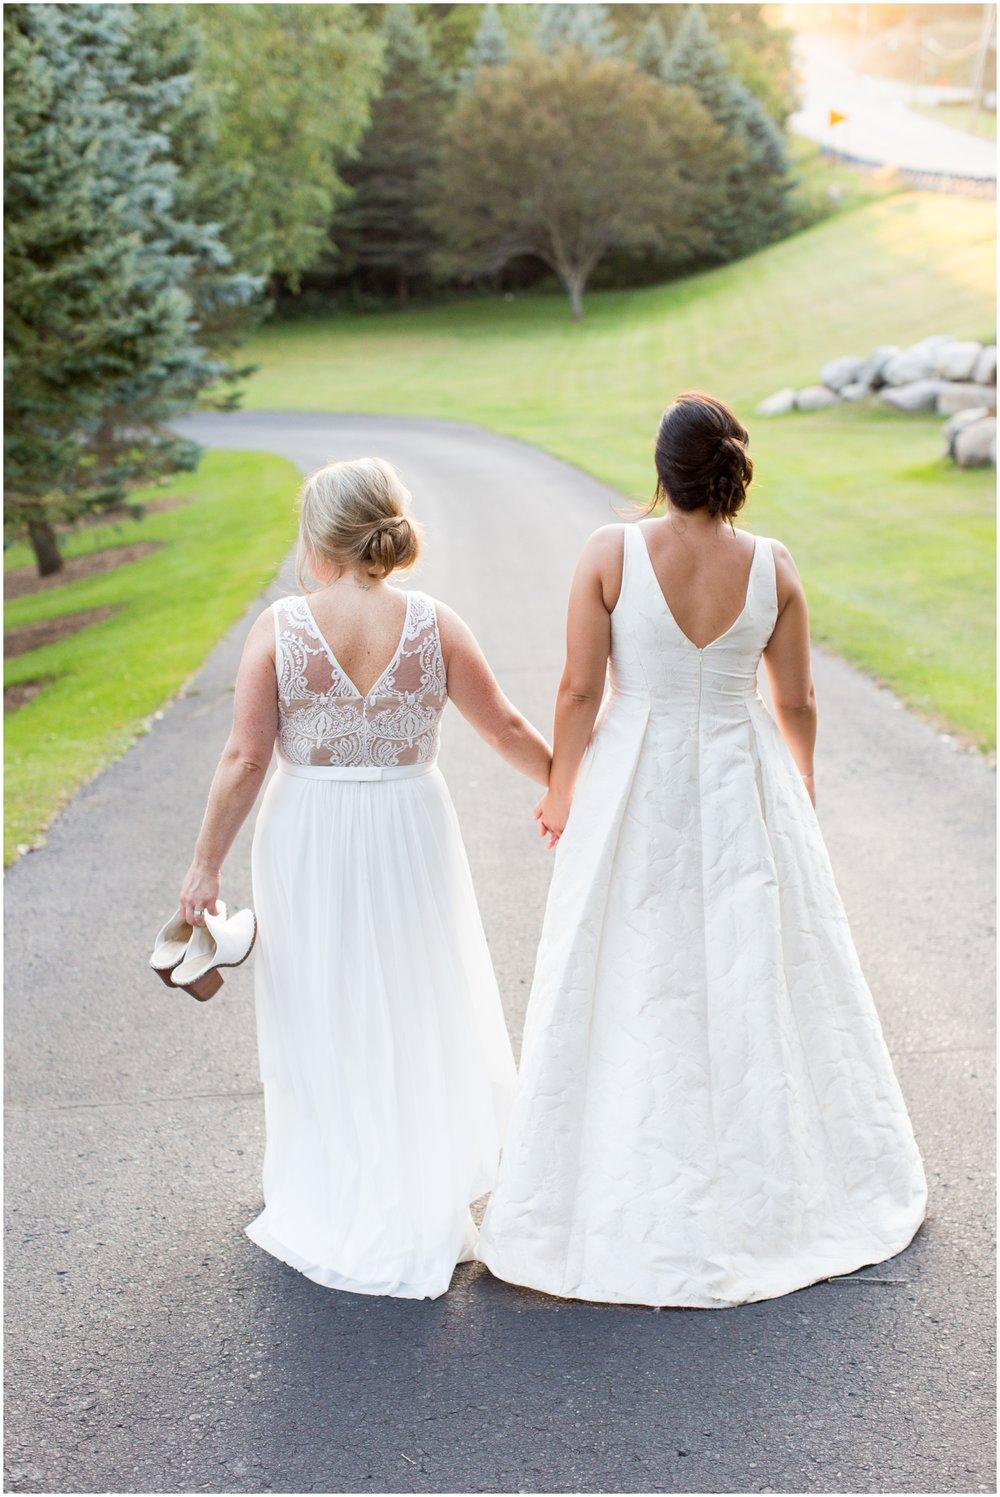 Brides holding their hands